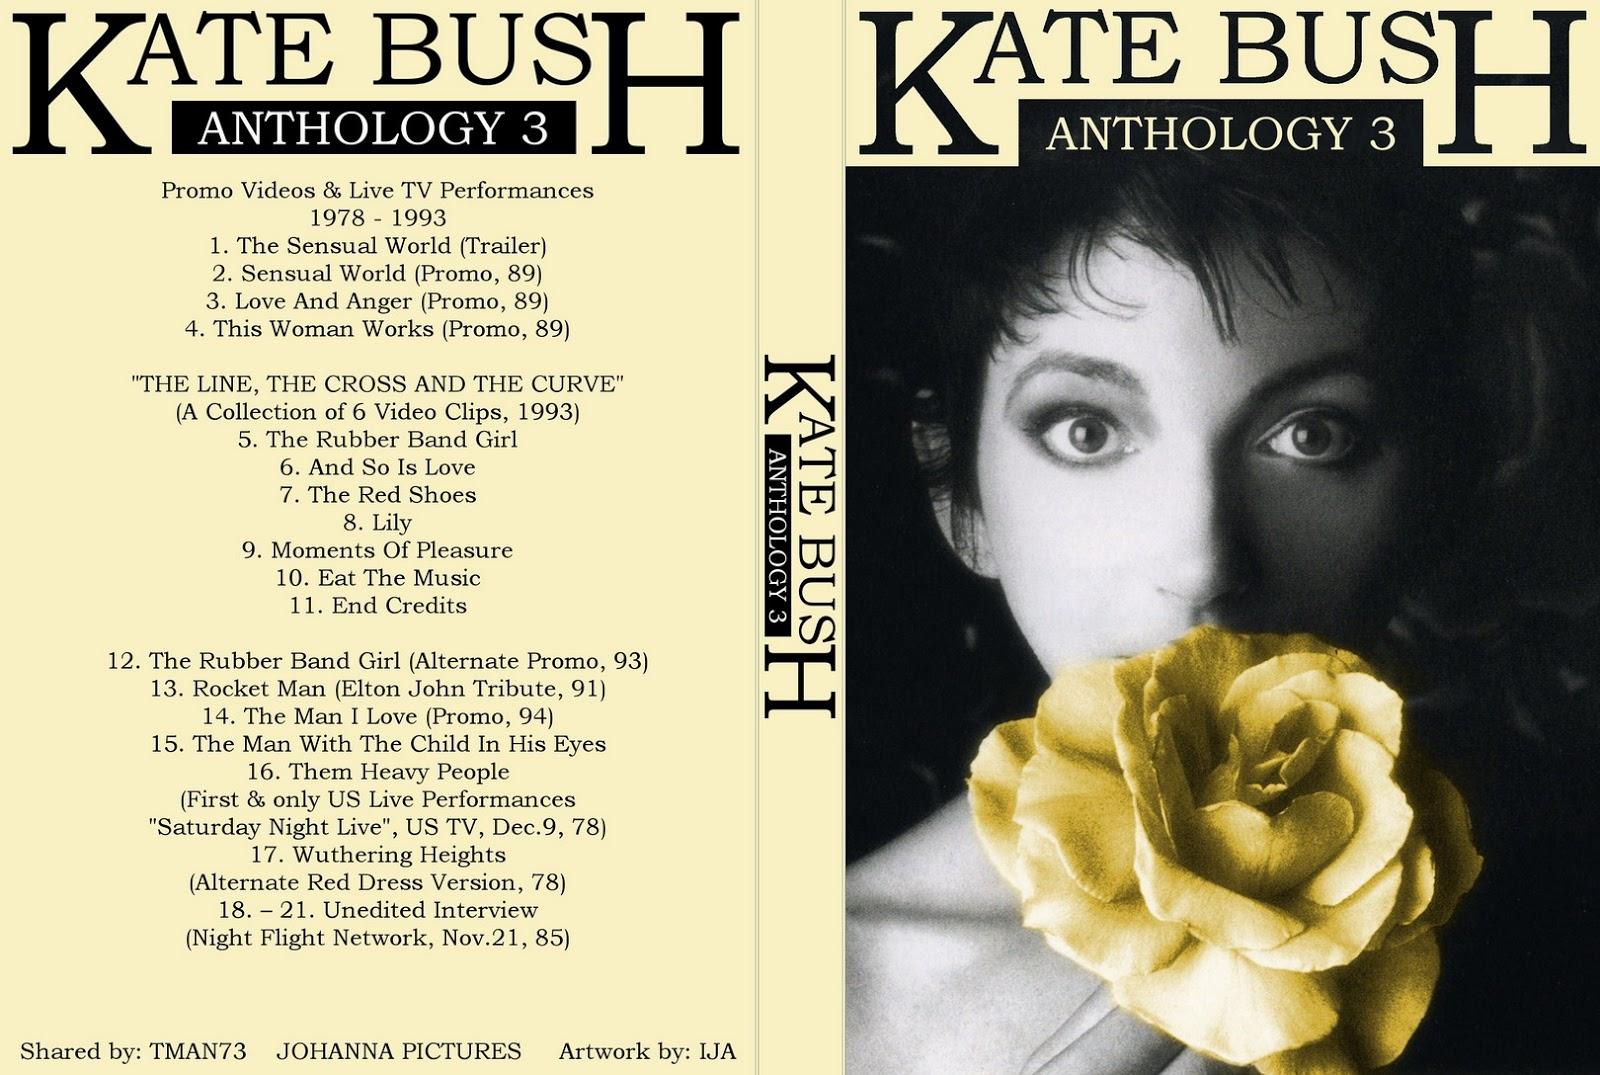 Amy Winehouse Nua t.u.b.e.: kate bush - anthology vol. 3 (dvdfull pro-shot)